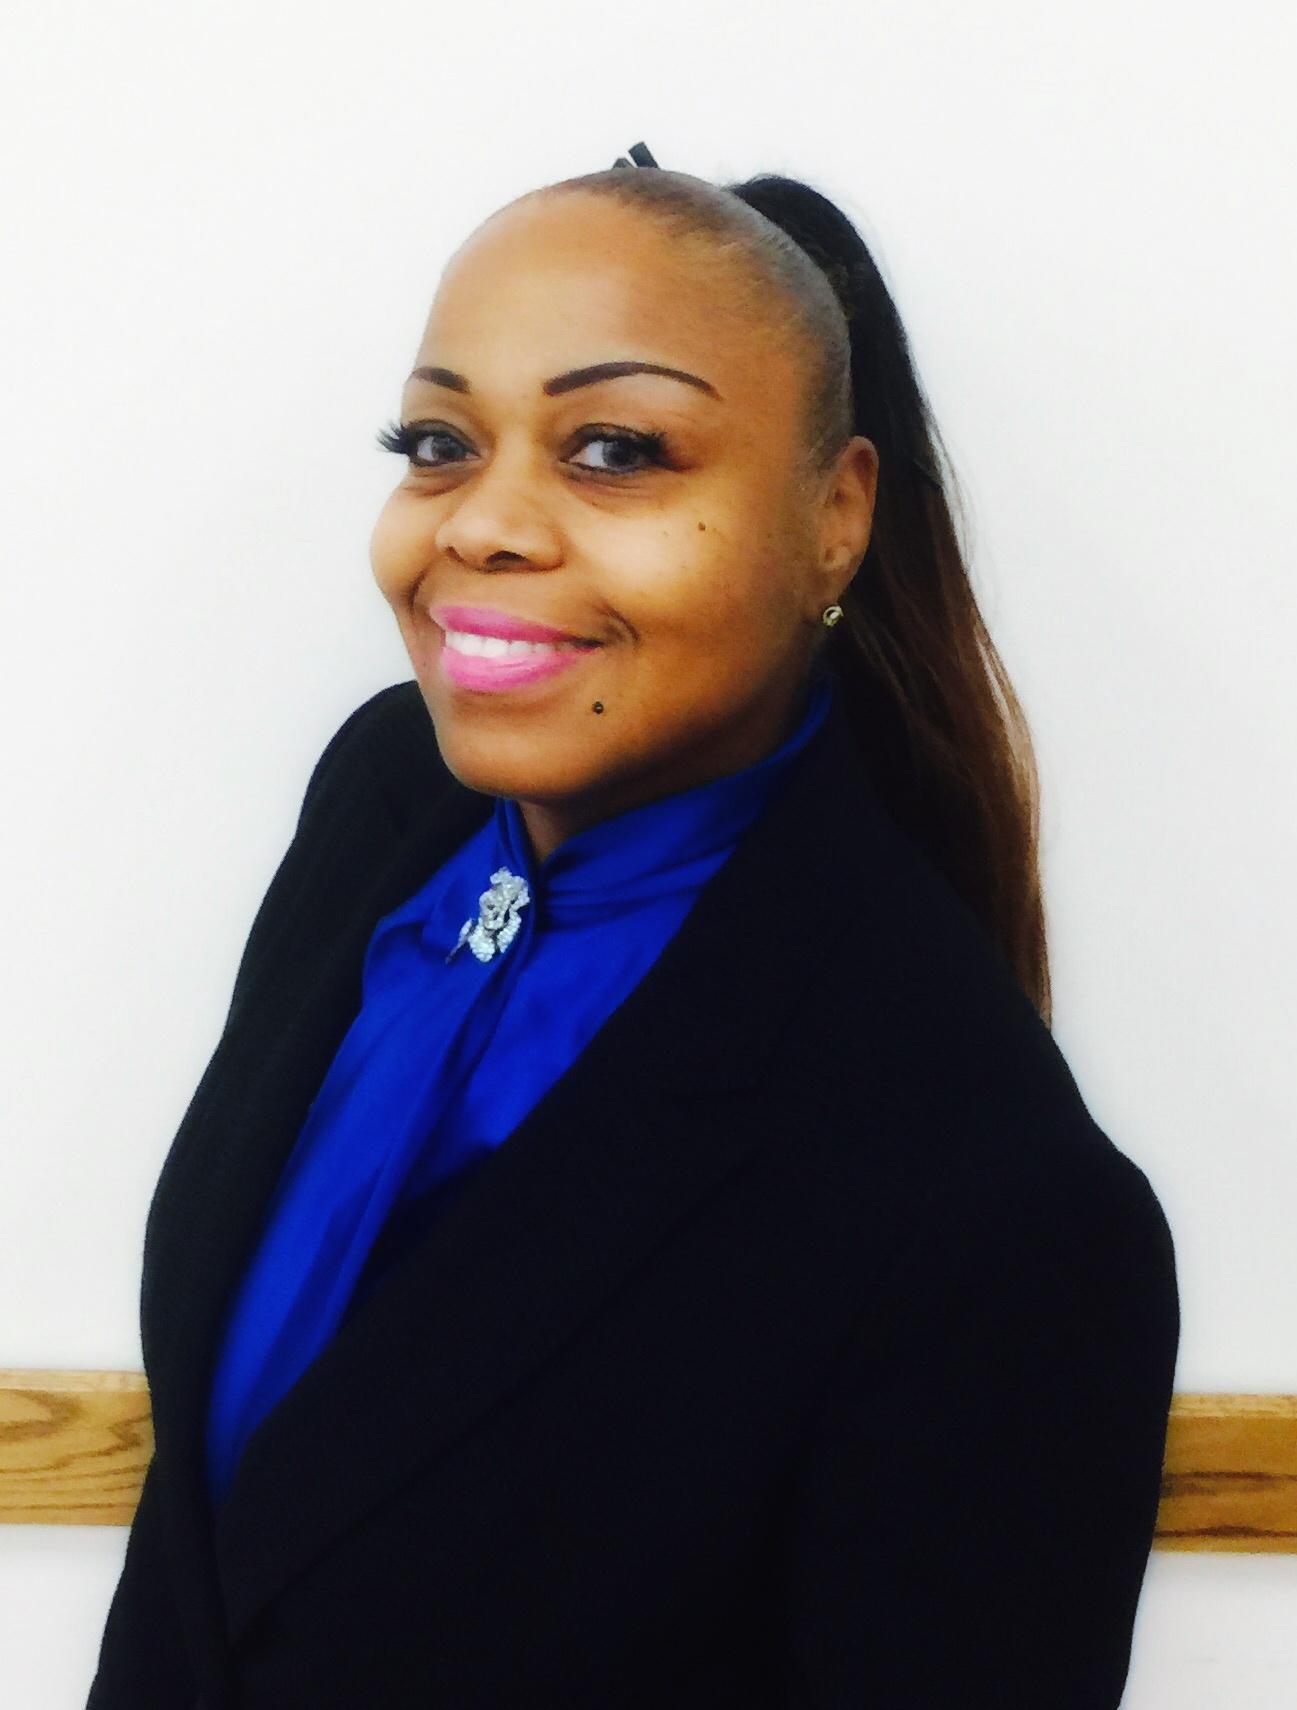 Ms. Celestine Jackson Assistant Strategies & Logistics Email:  celestine.jackson@k12.dc.gov  Room Main Office    Bio